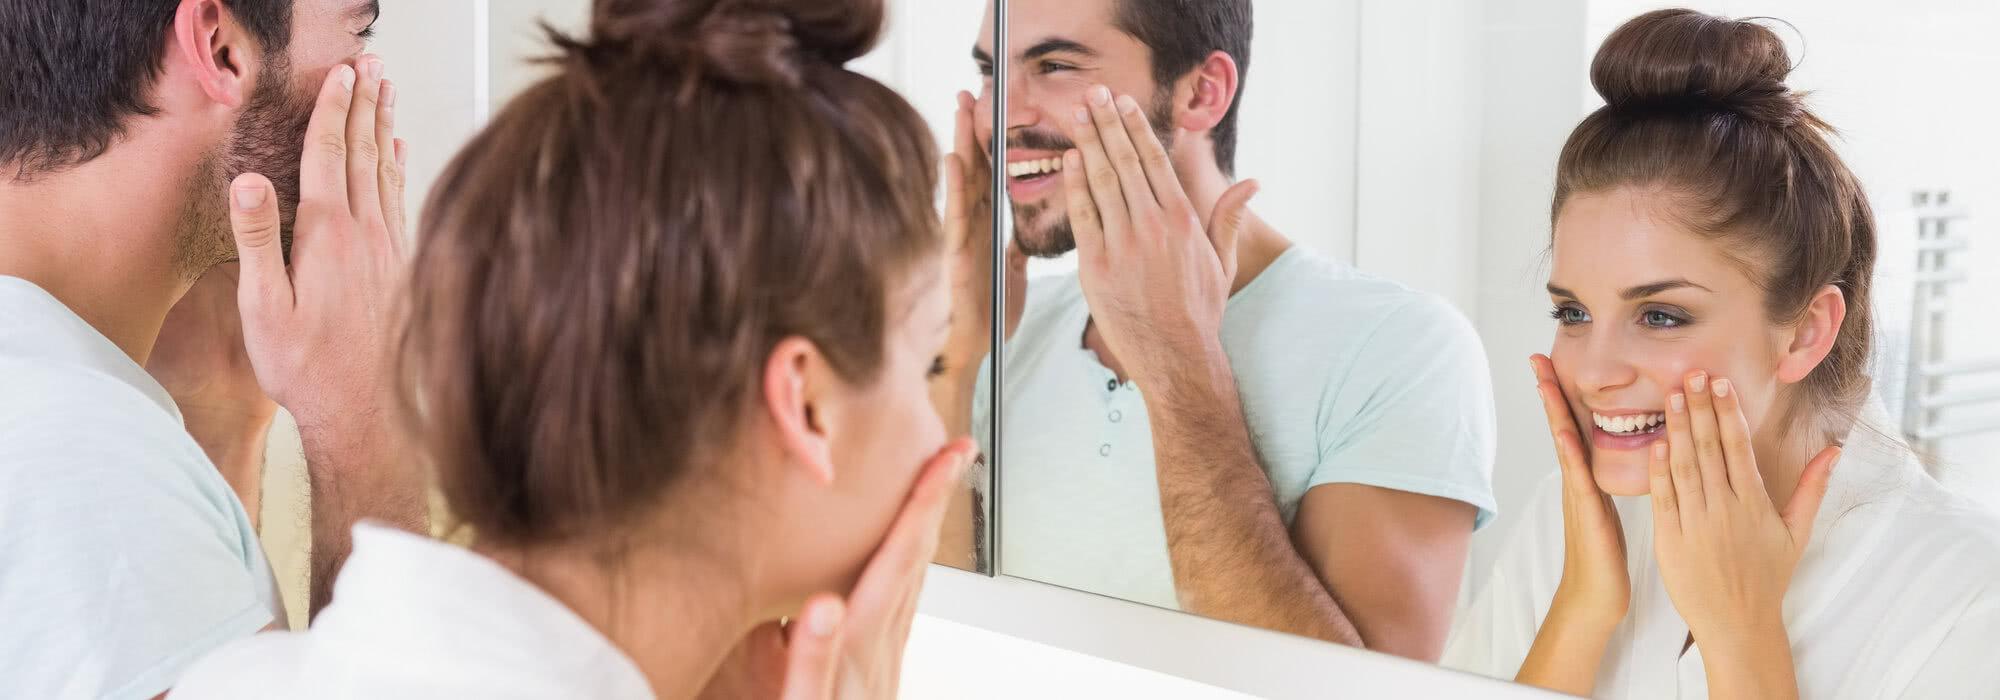 SPRINZ Care tips for the bathroom